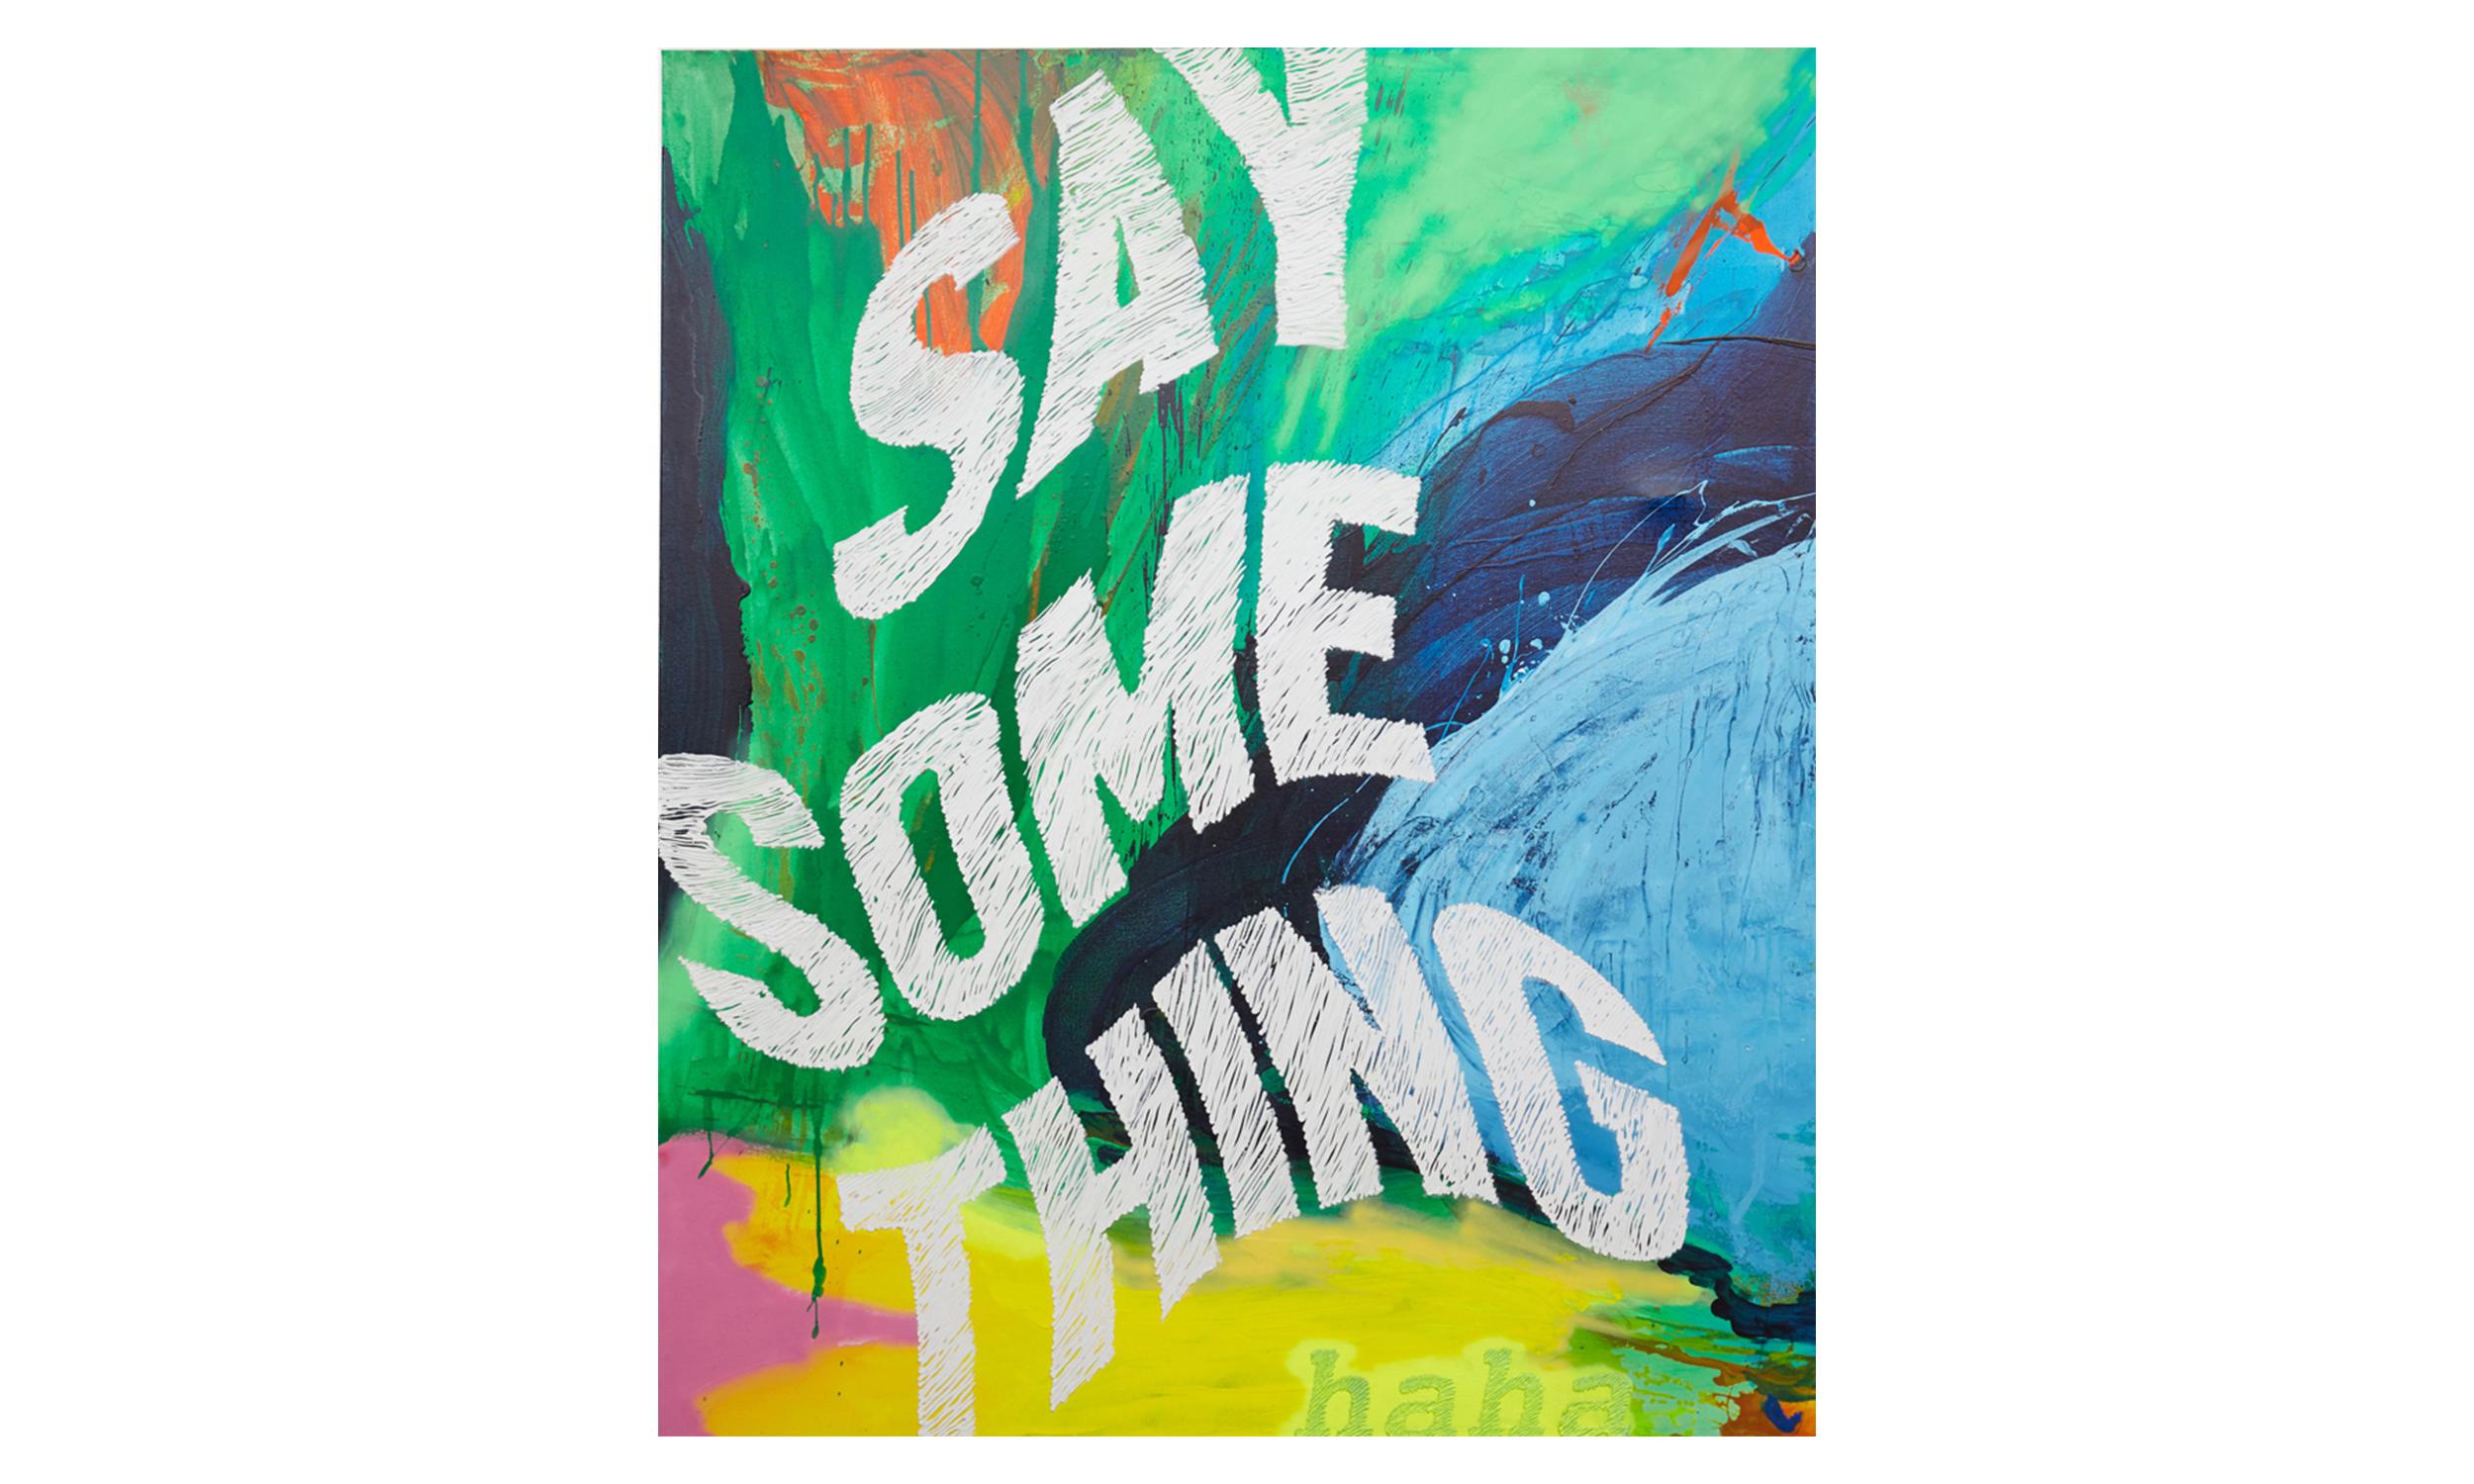 Say Something (haha)  2016 Oil, Acrylic, Caulk on Canvas 72h x 60w in